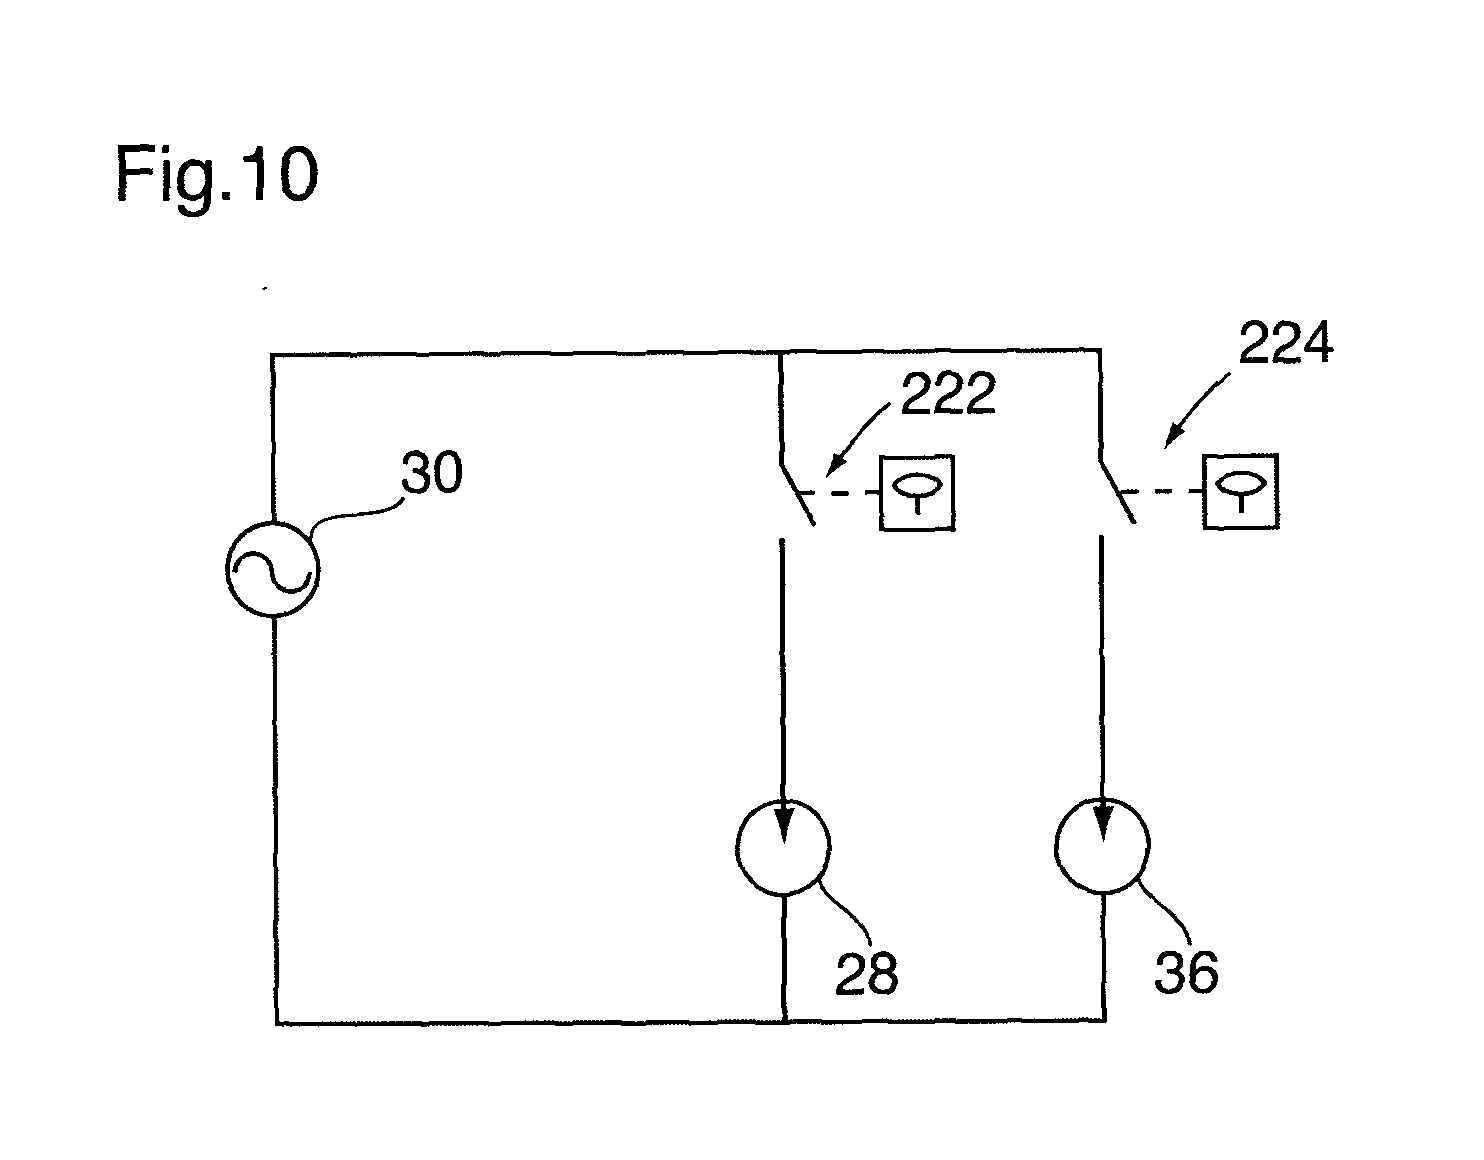 Partner Acs Wiring Diagram Not Lossing Zoeller 10 0623 30 Images Avaya System